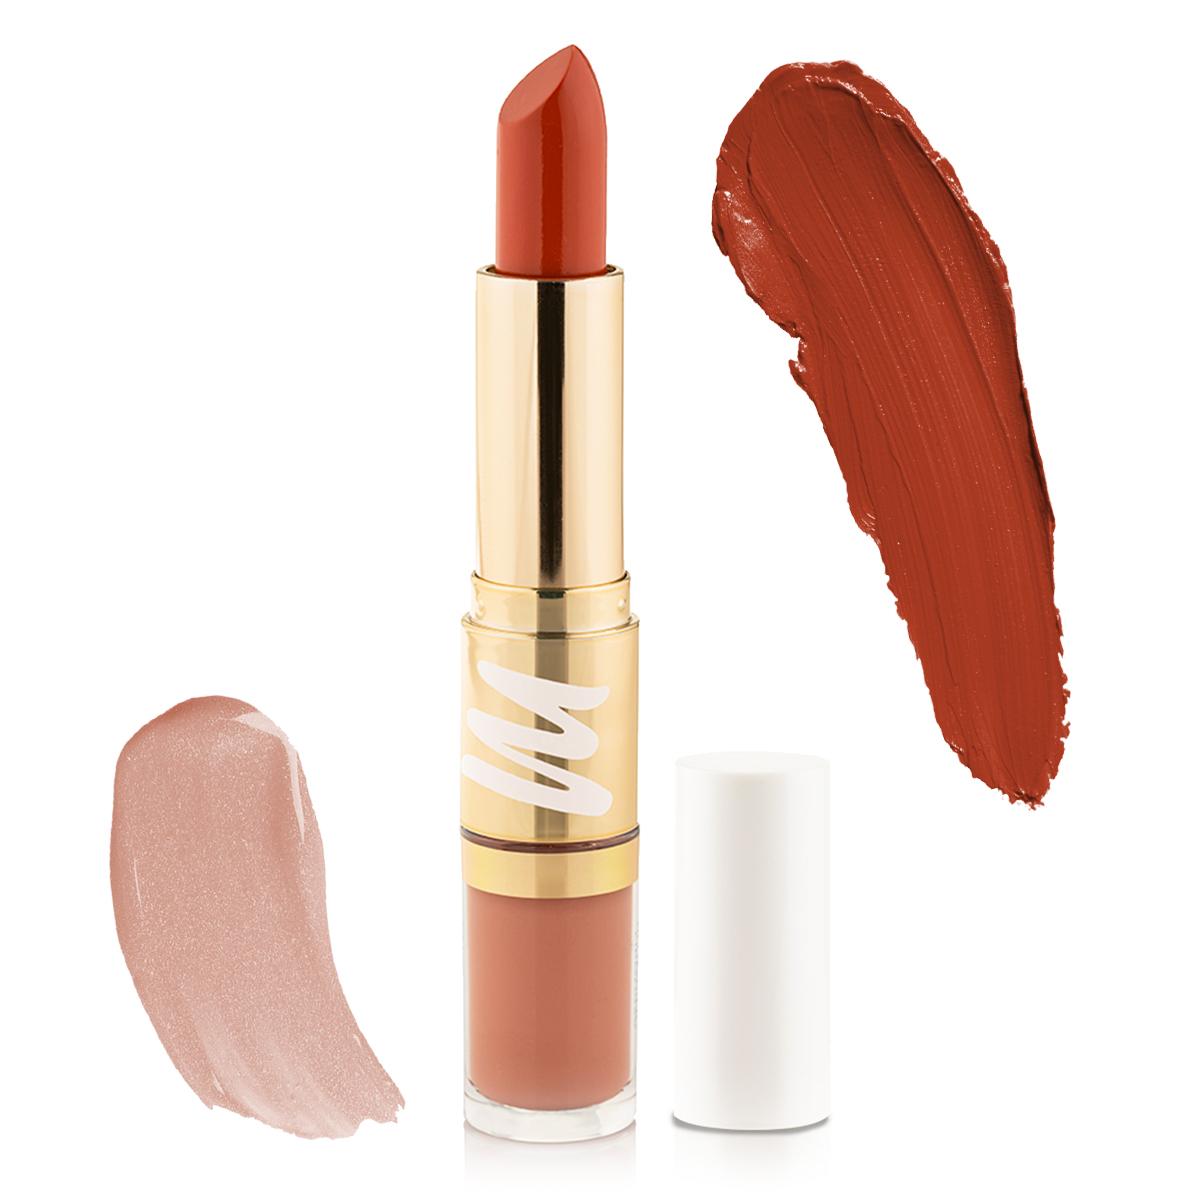 2 in 1 Plumping Lipstick + Plumping Lip gloss - Mystique